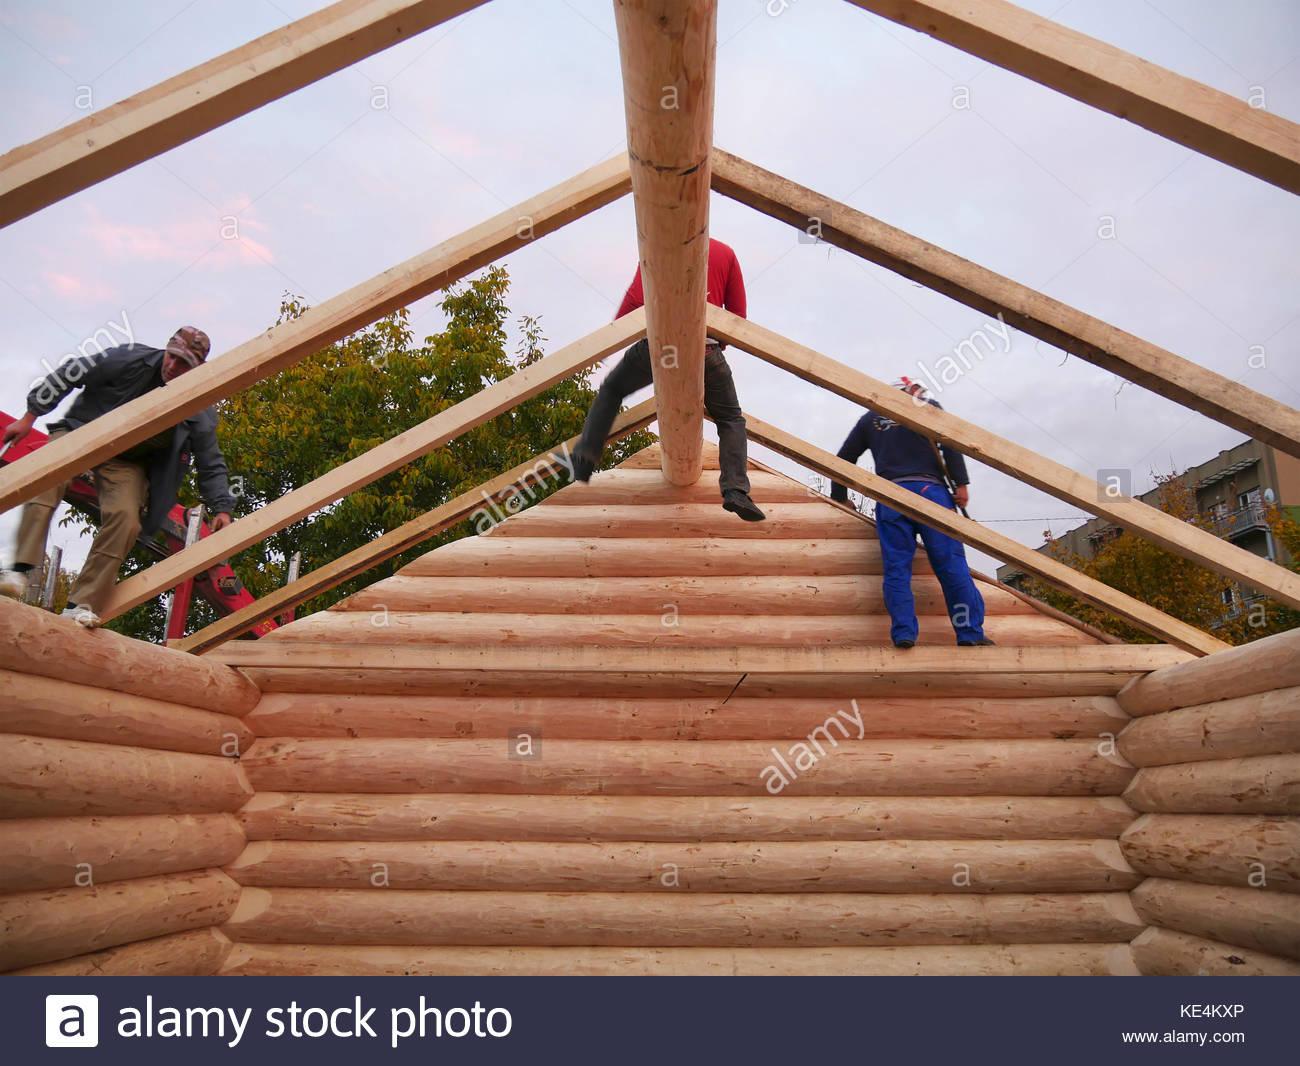 Log cabin interior stock photos log cabin interior stock for Log cabin roof construction